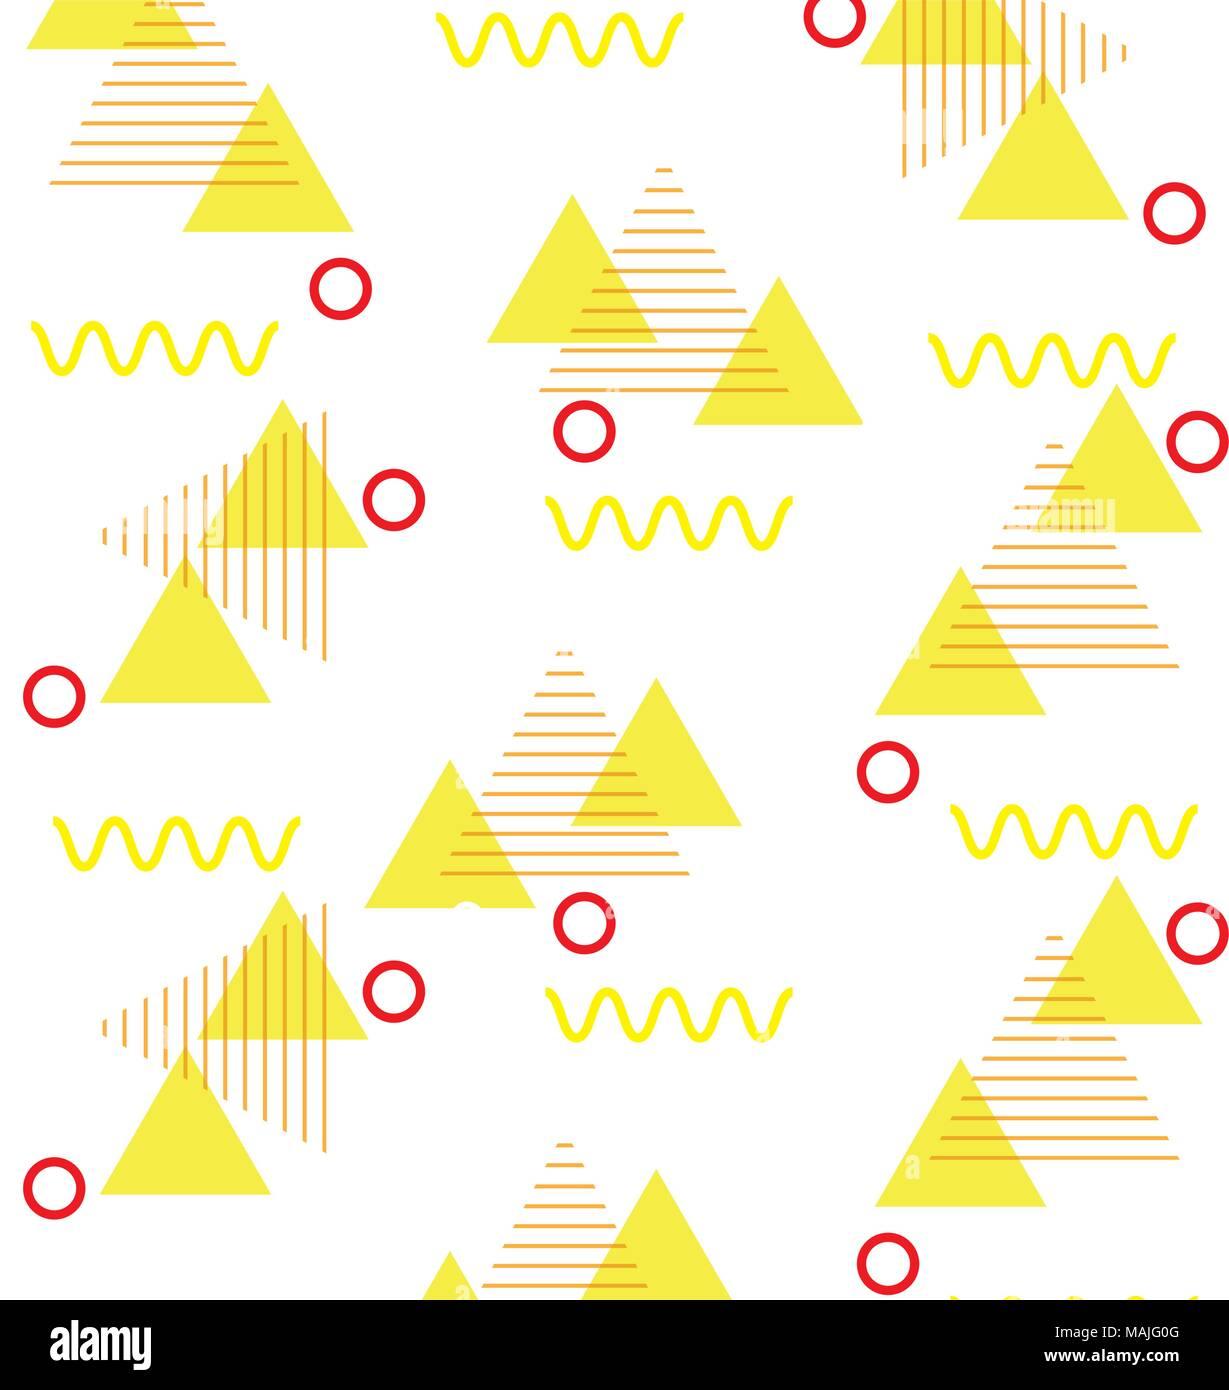 Geometrische Figuren Kunst Hintergrund Vector Illustration Design Stock Vektorgrafik Alamy